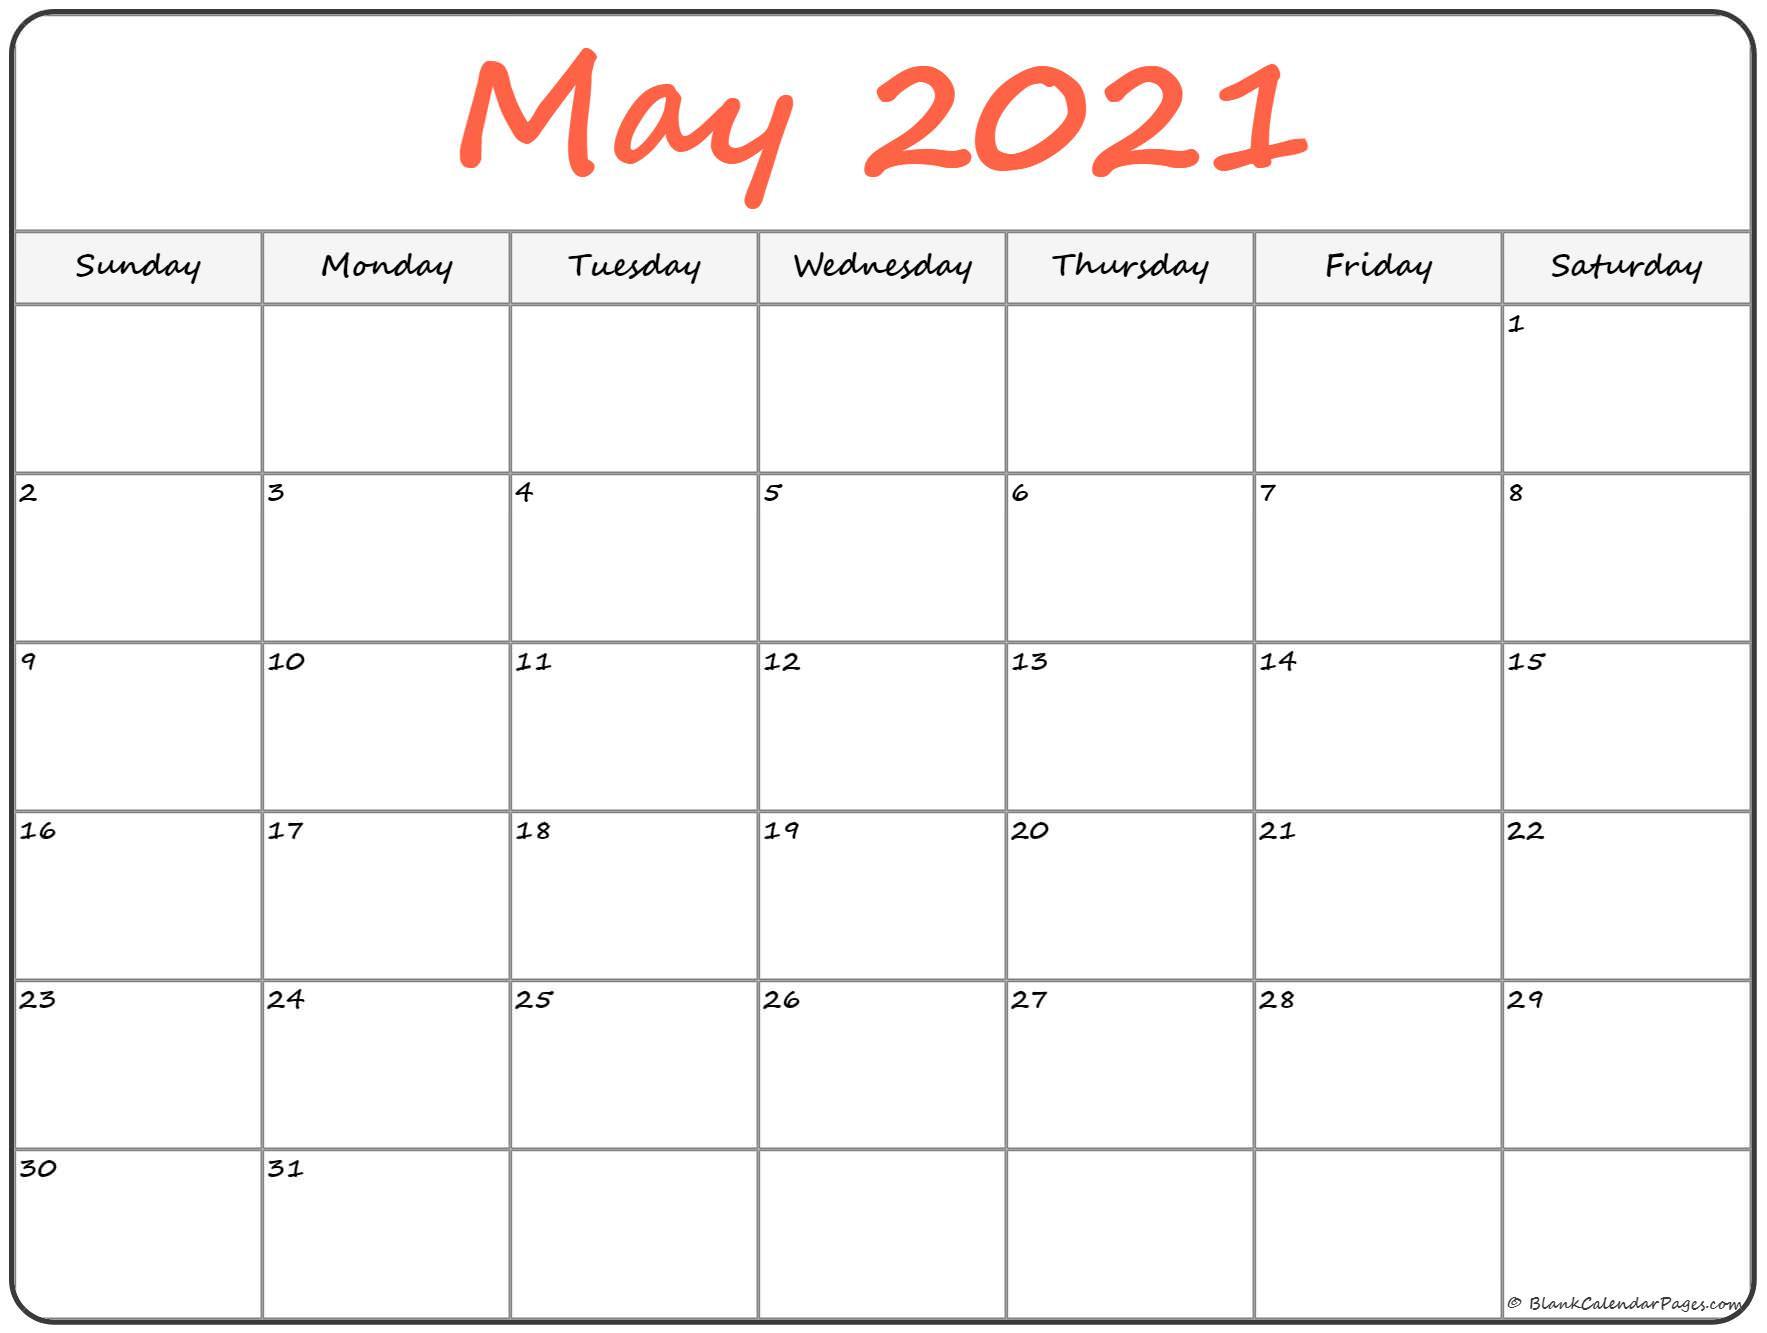 May 2021 Calendar   Free Printable Calendar Templates-Free Printable Calendar 2021 4 Months Per Page May August